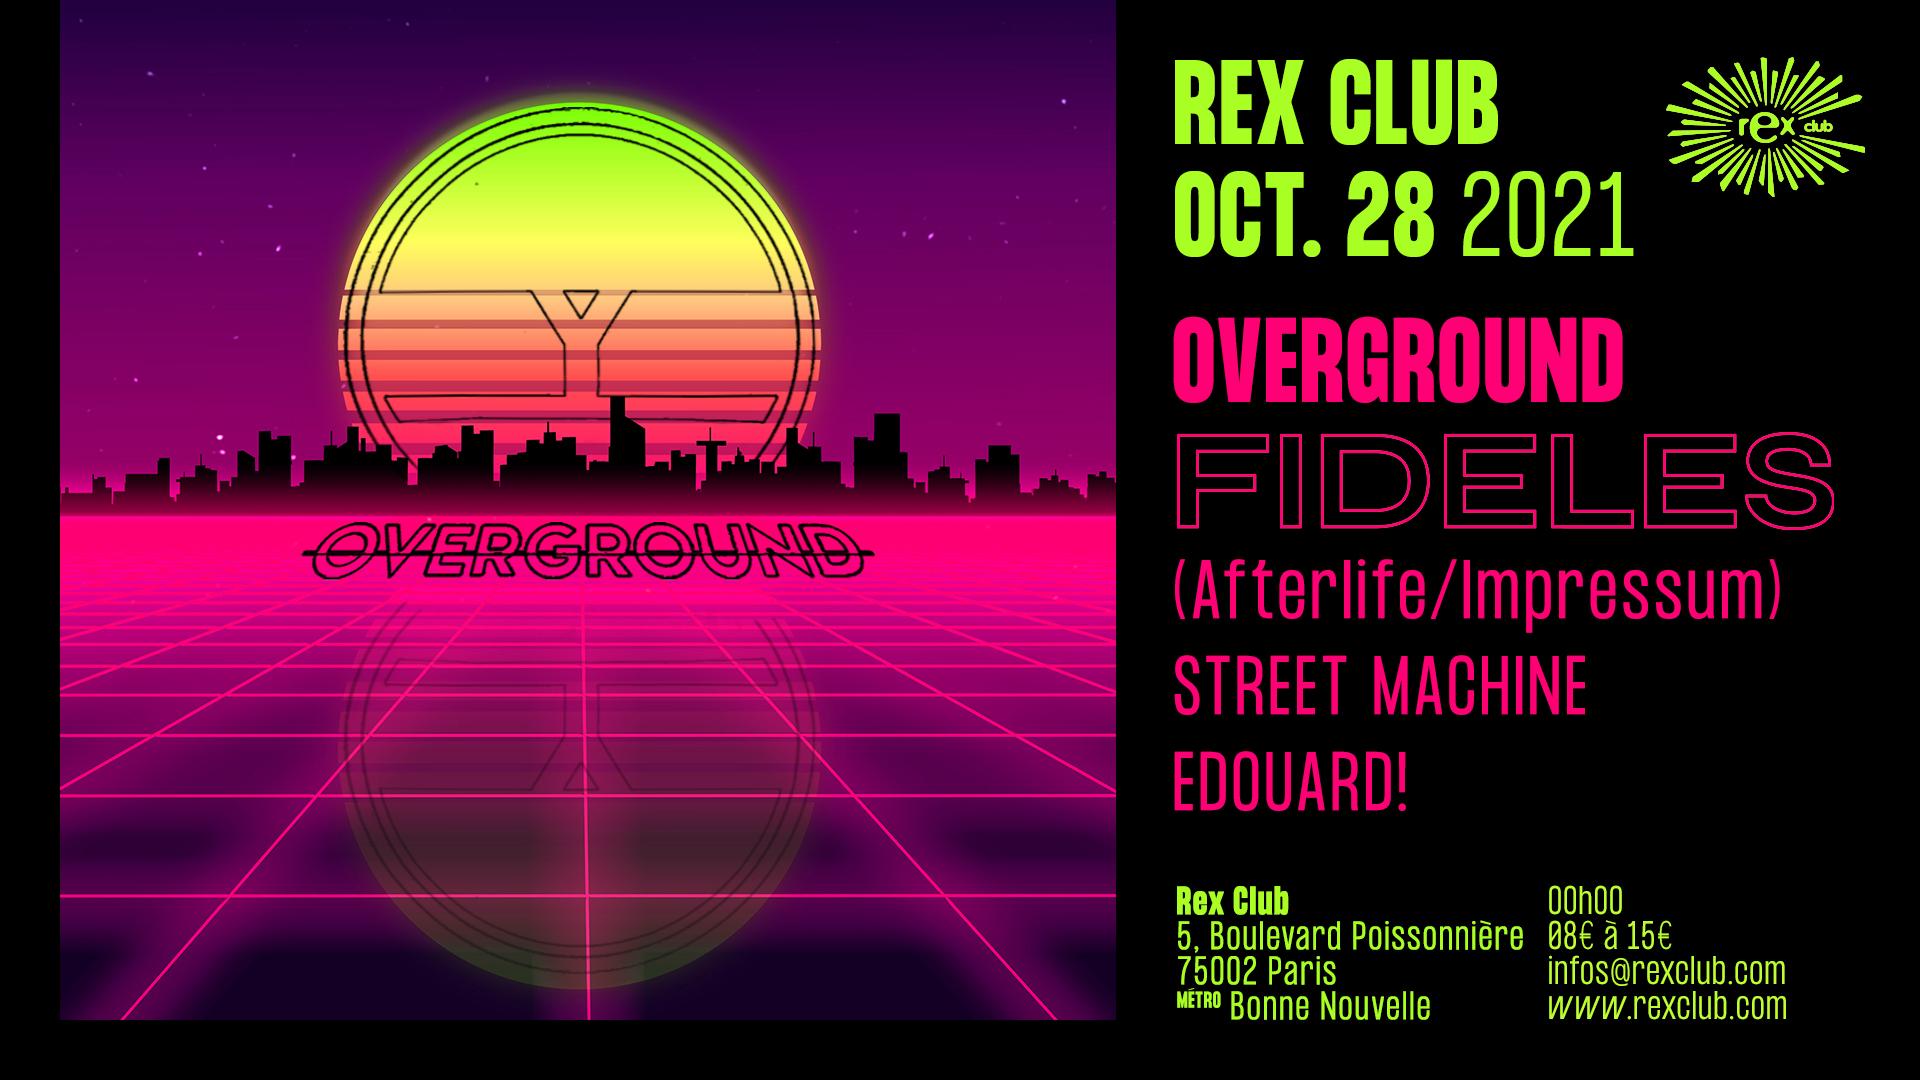 Overground Opening S.08 w/ Fideles, Street Machine, Edouard!